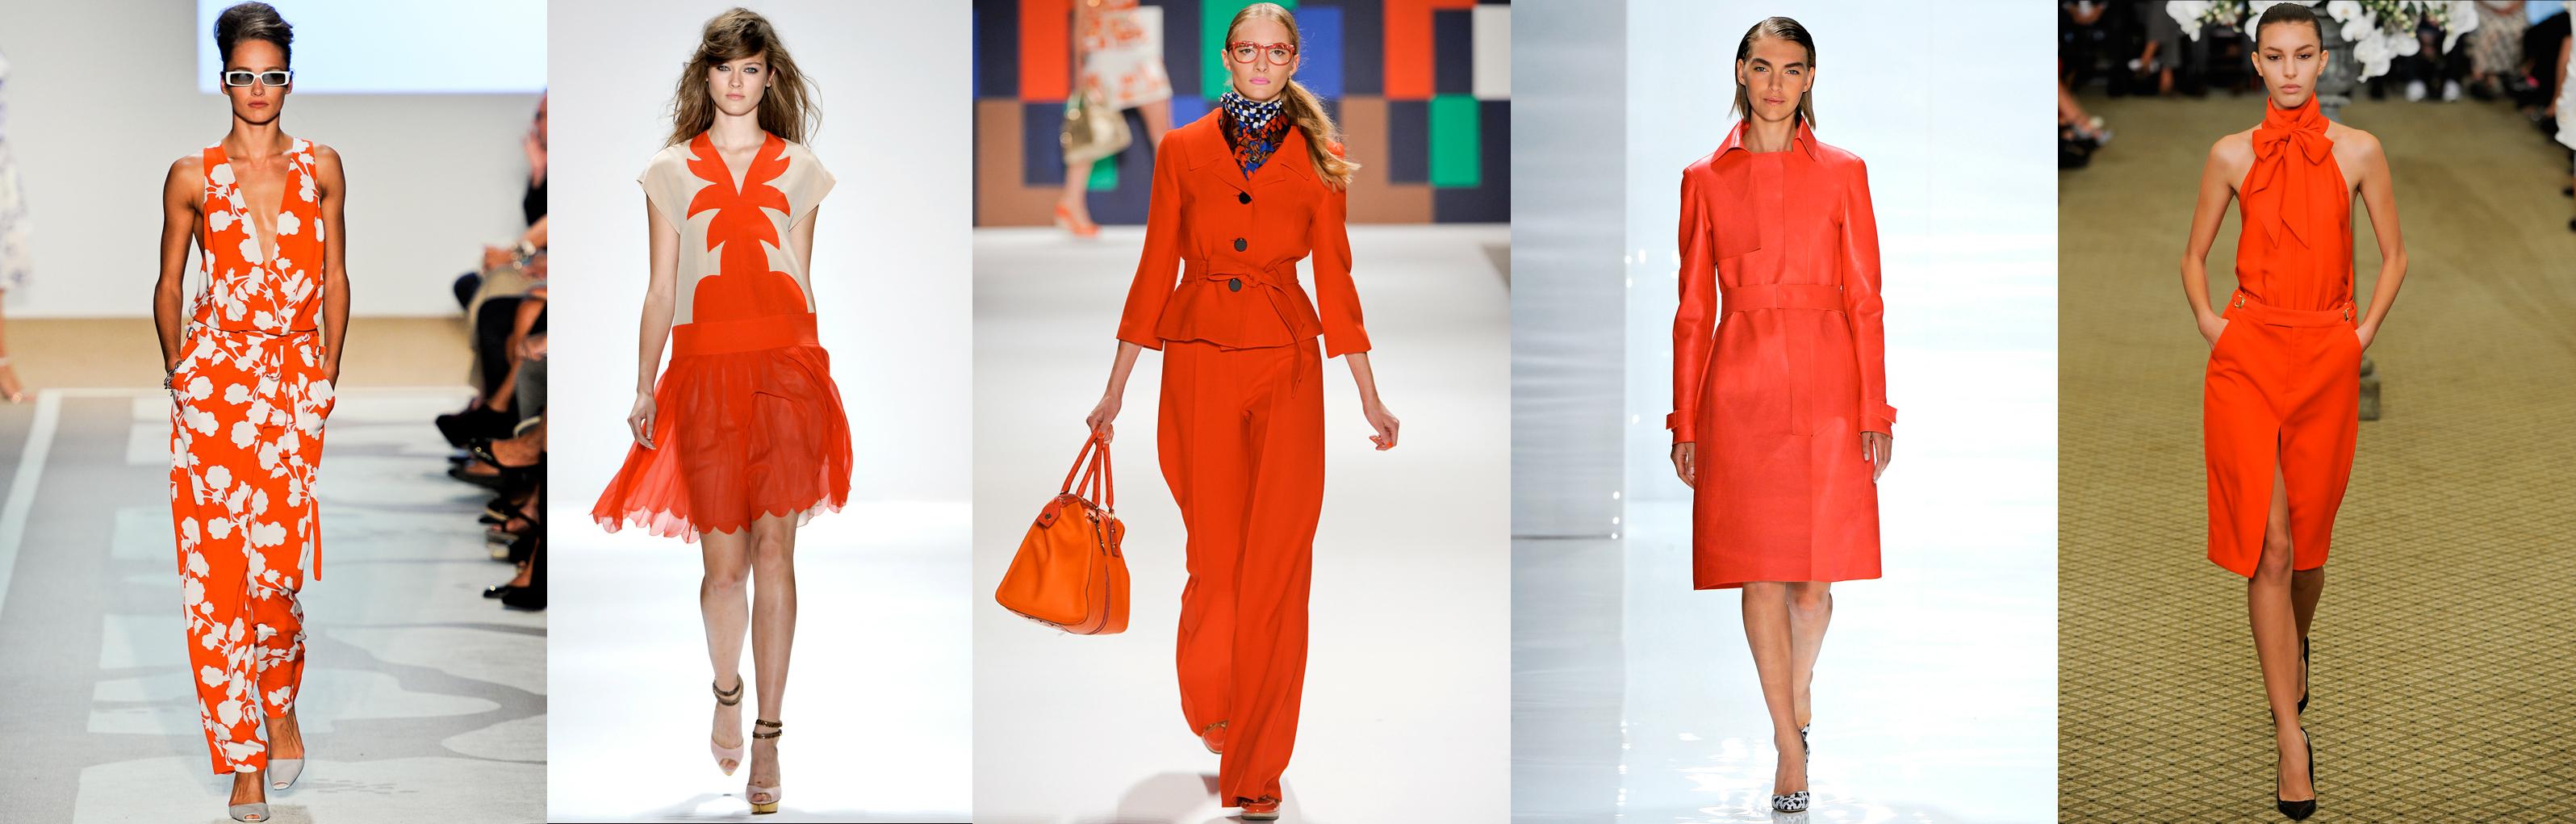 Orange…is it the new black for Spring?! – Julia Cavallaro ...